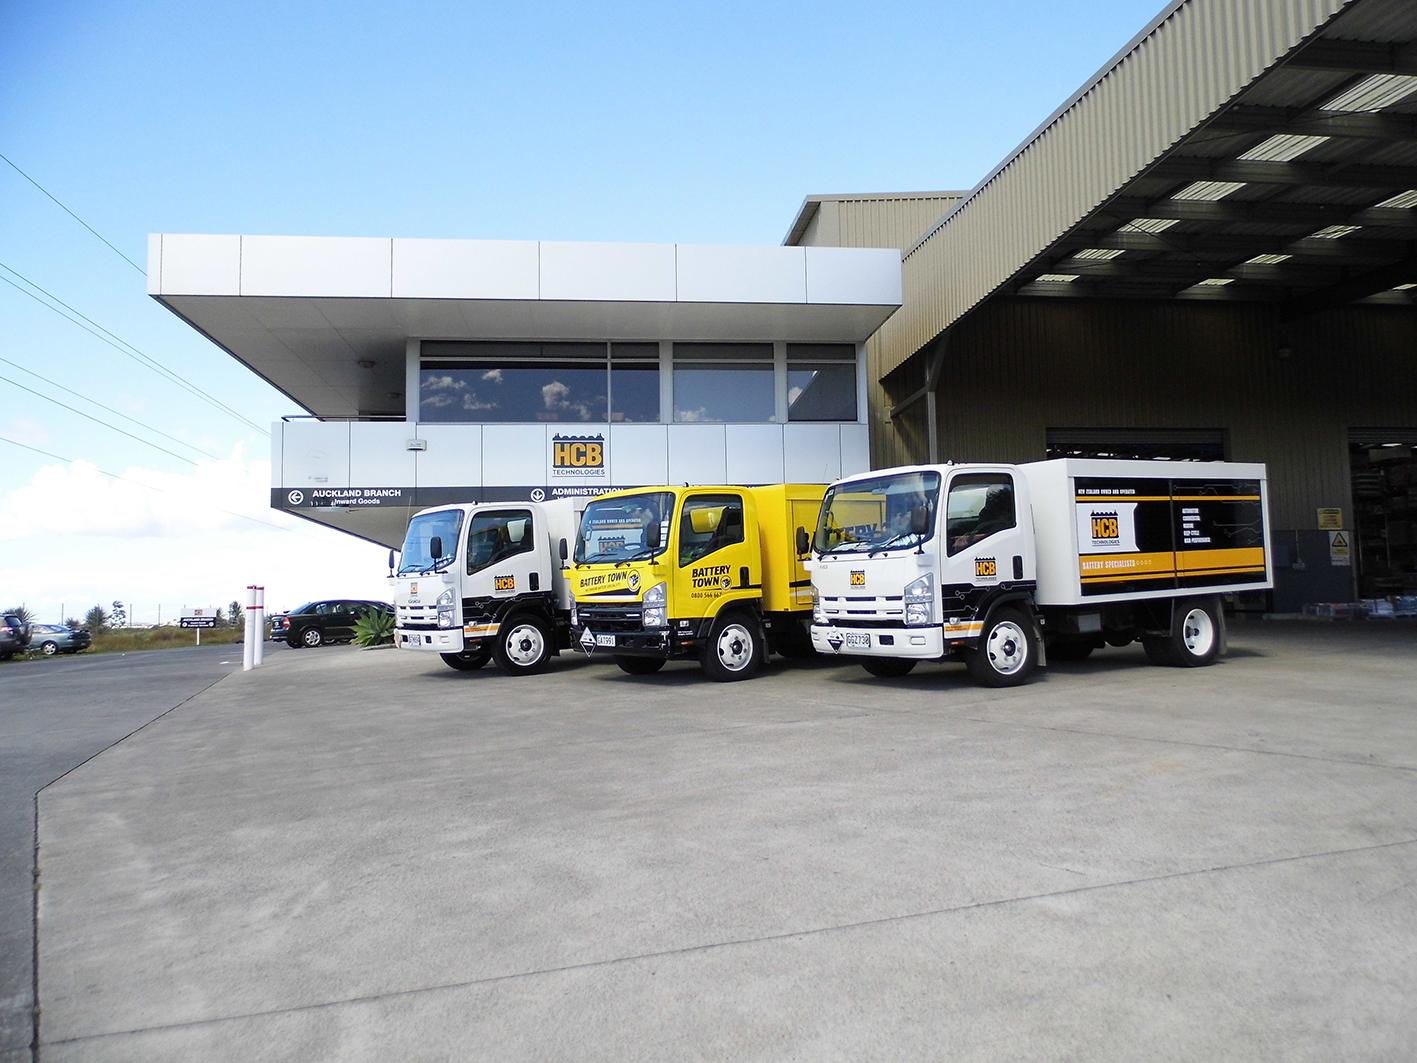 HCB_Mahunga_Drive_Trucks.jpg